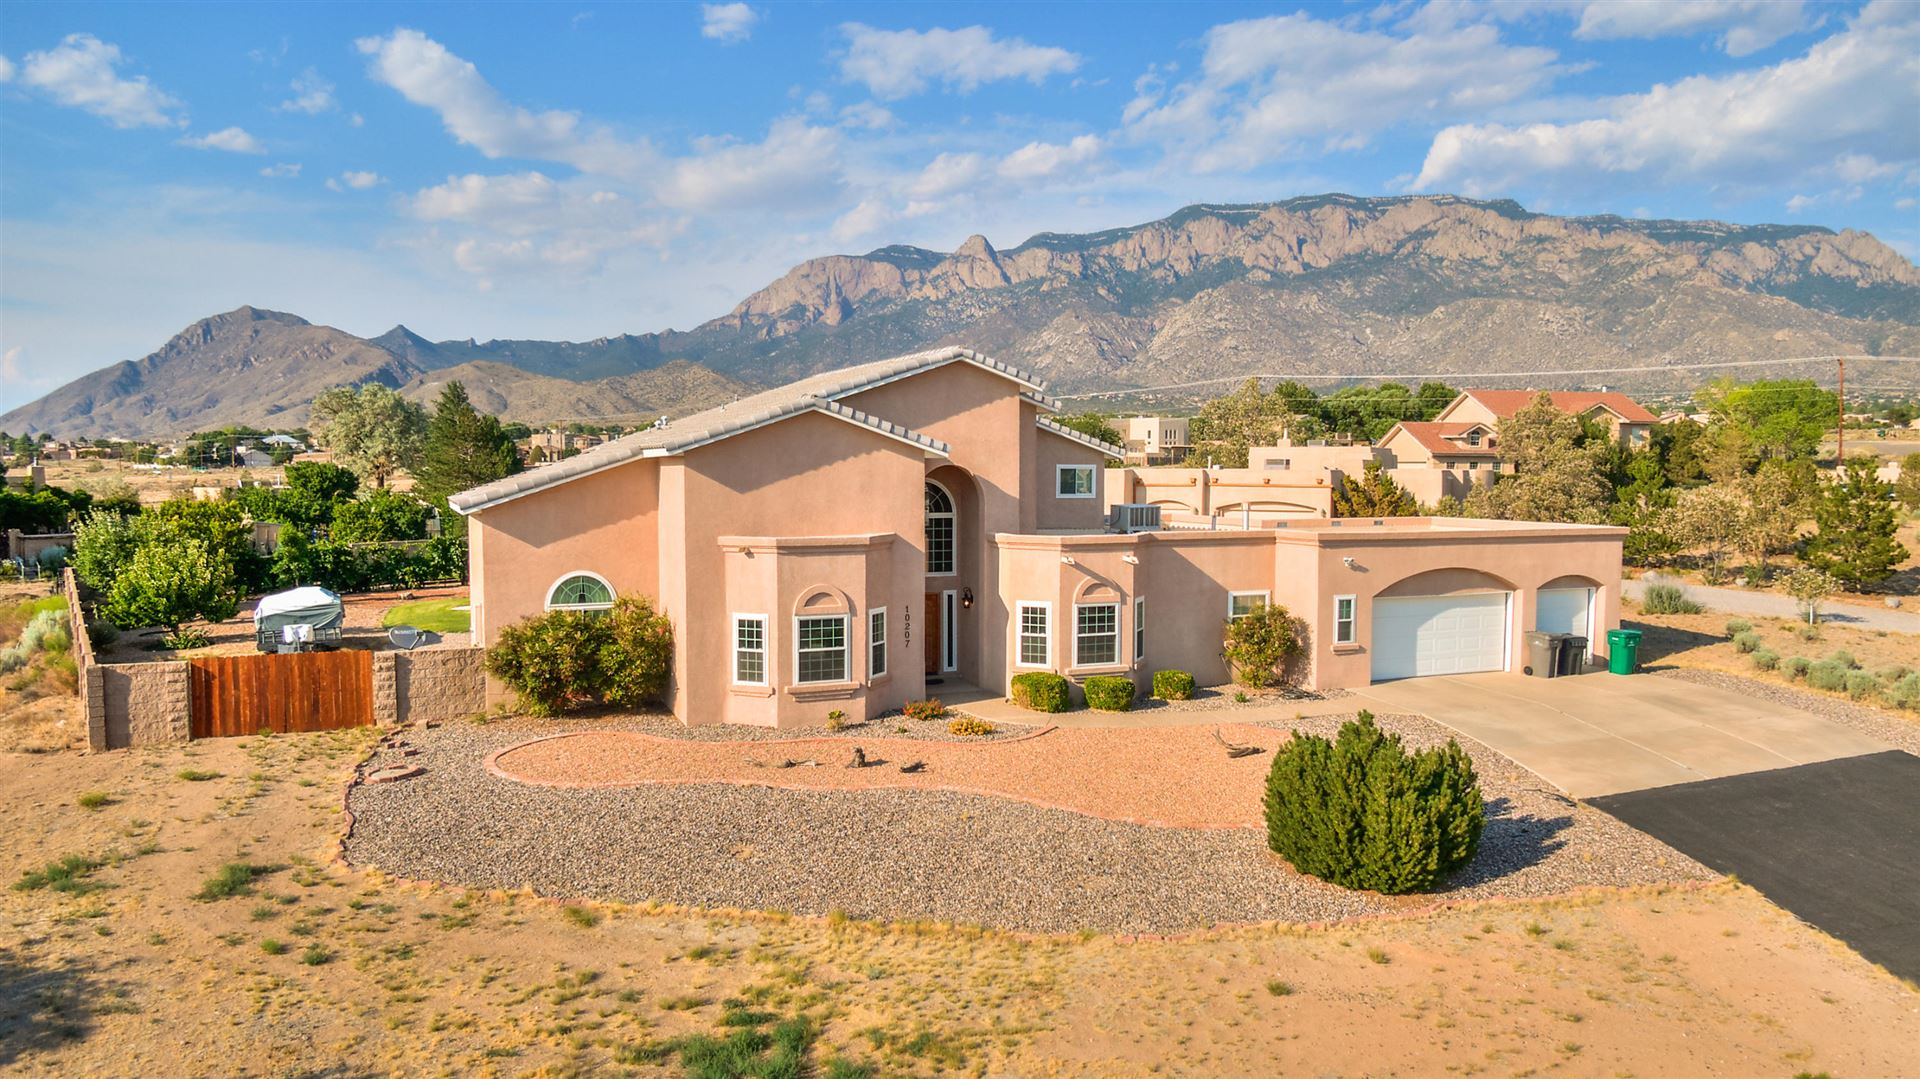 Photo of 10207 CORONA Avenue NE, Albuquerque, NM 87122 (MLS # 994794)